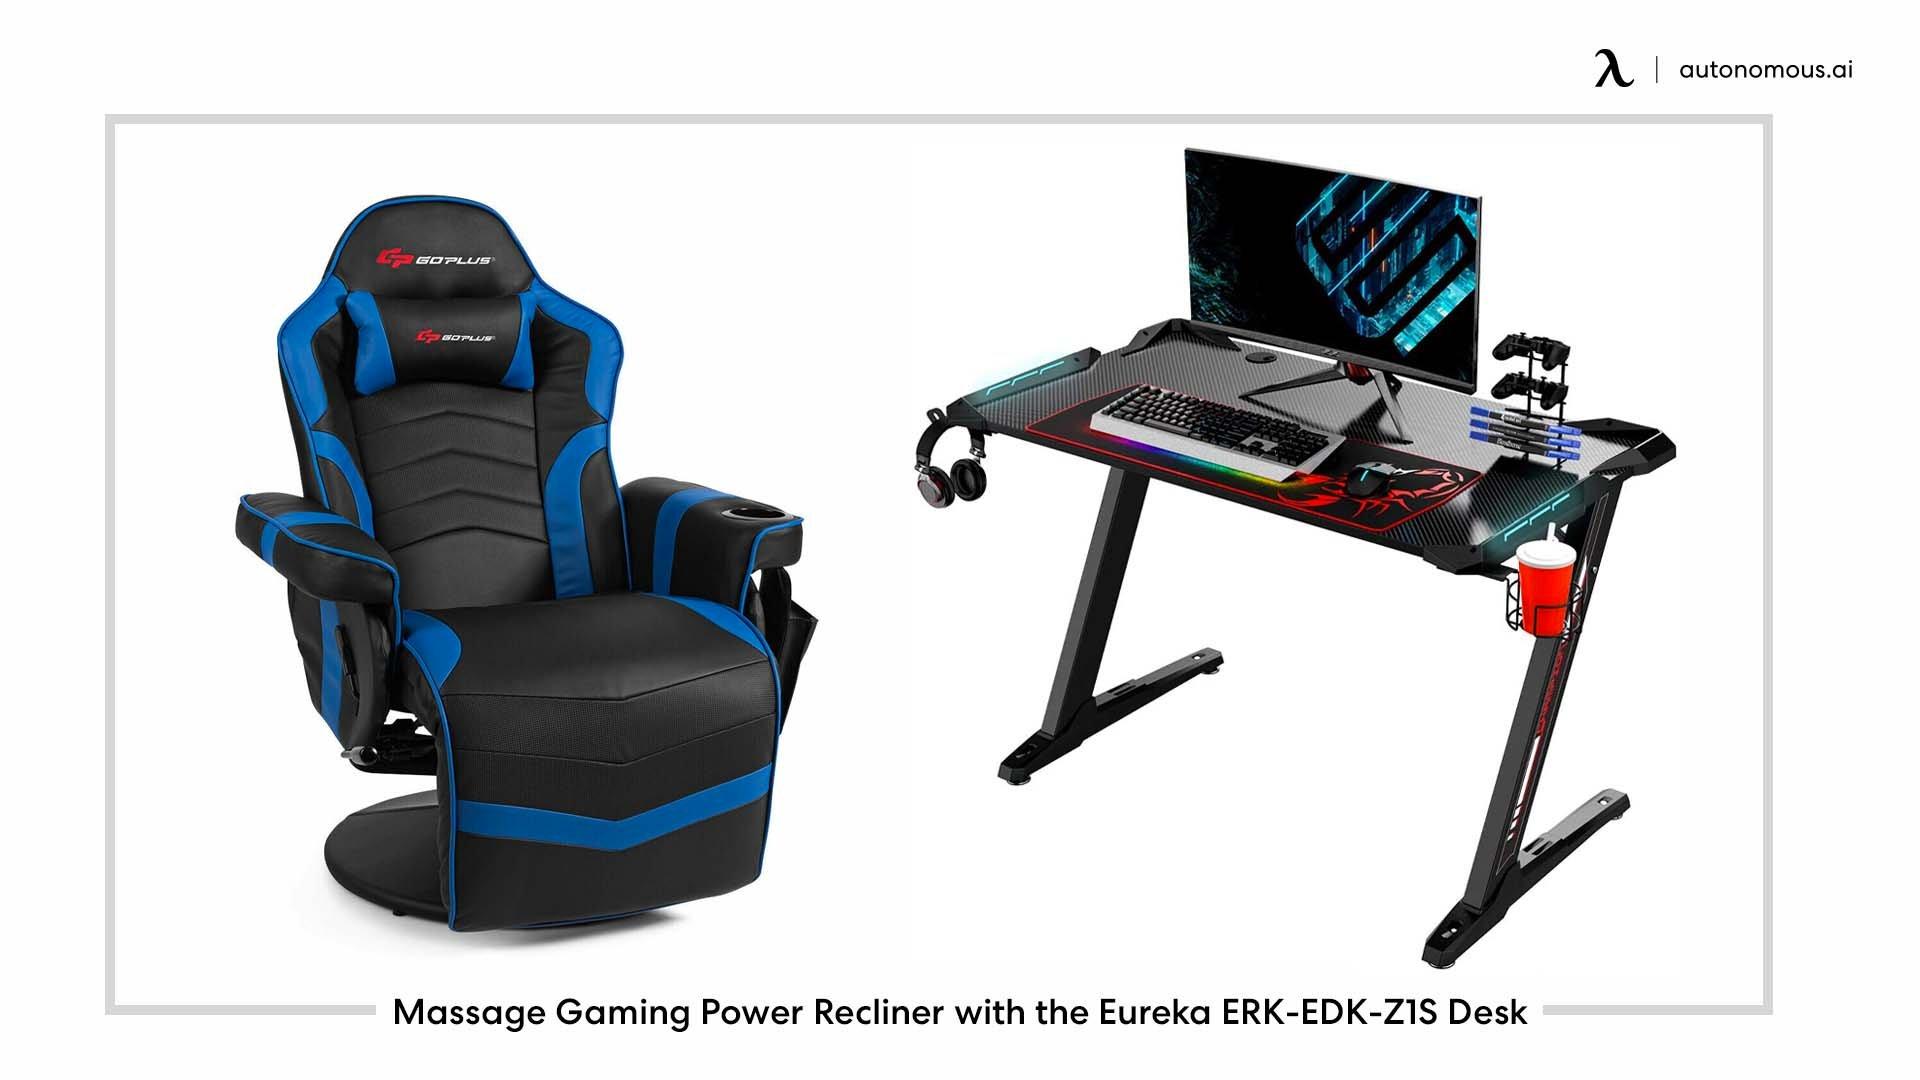 Massage Gaming Power Recliner with the Eureka ERK-EDK-Z1S Desk